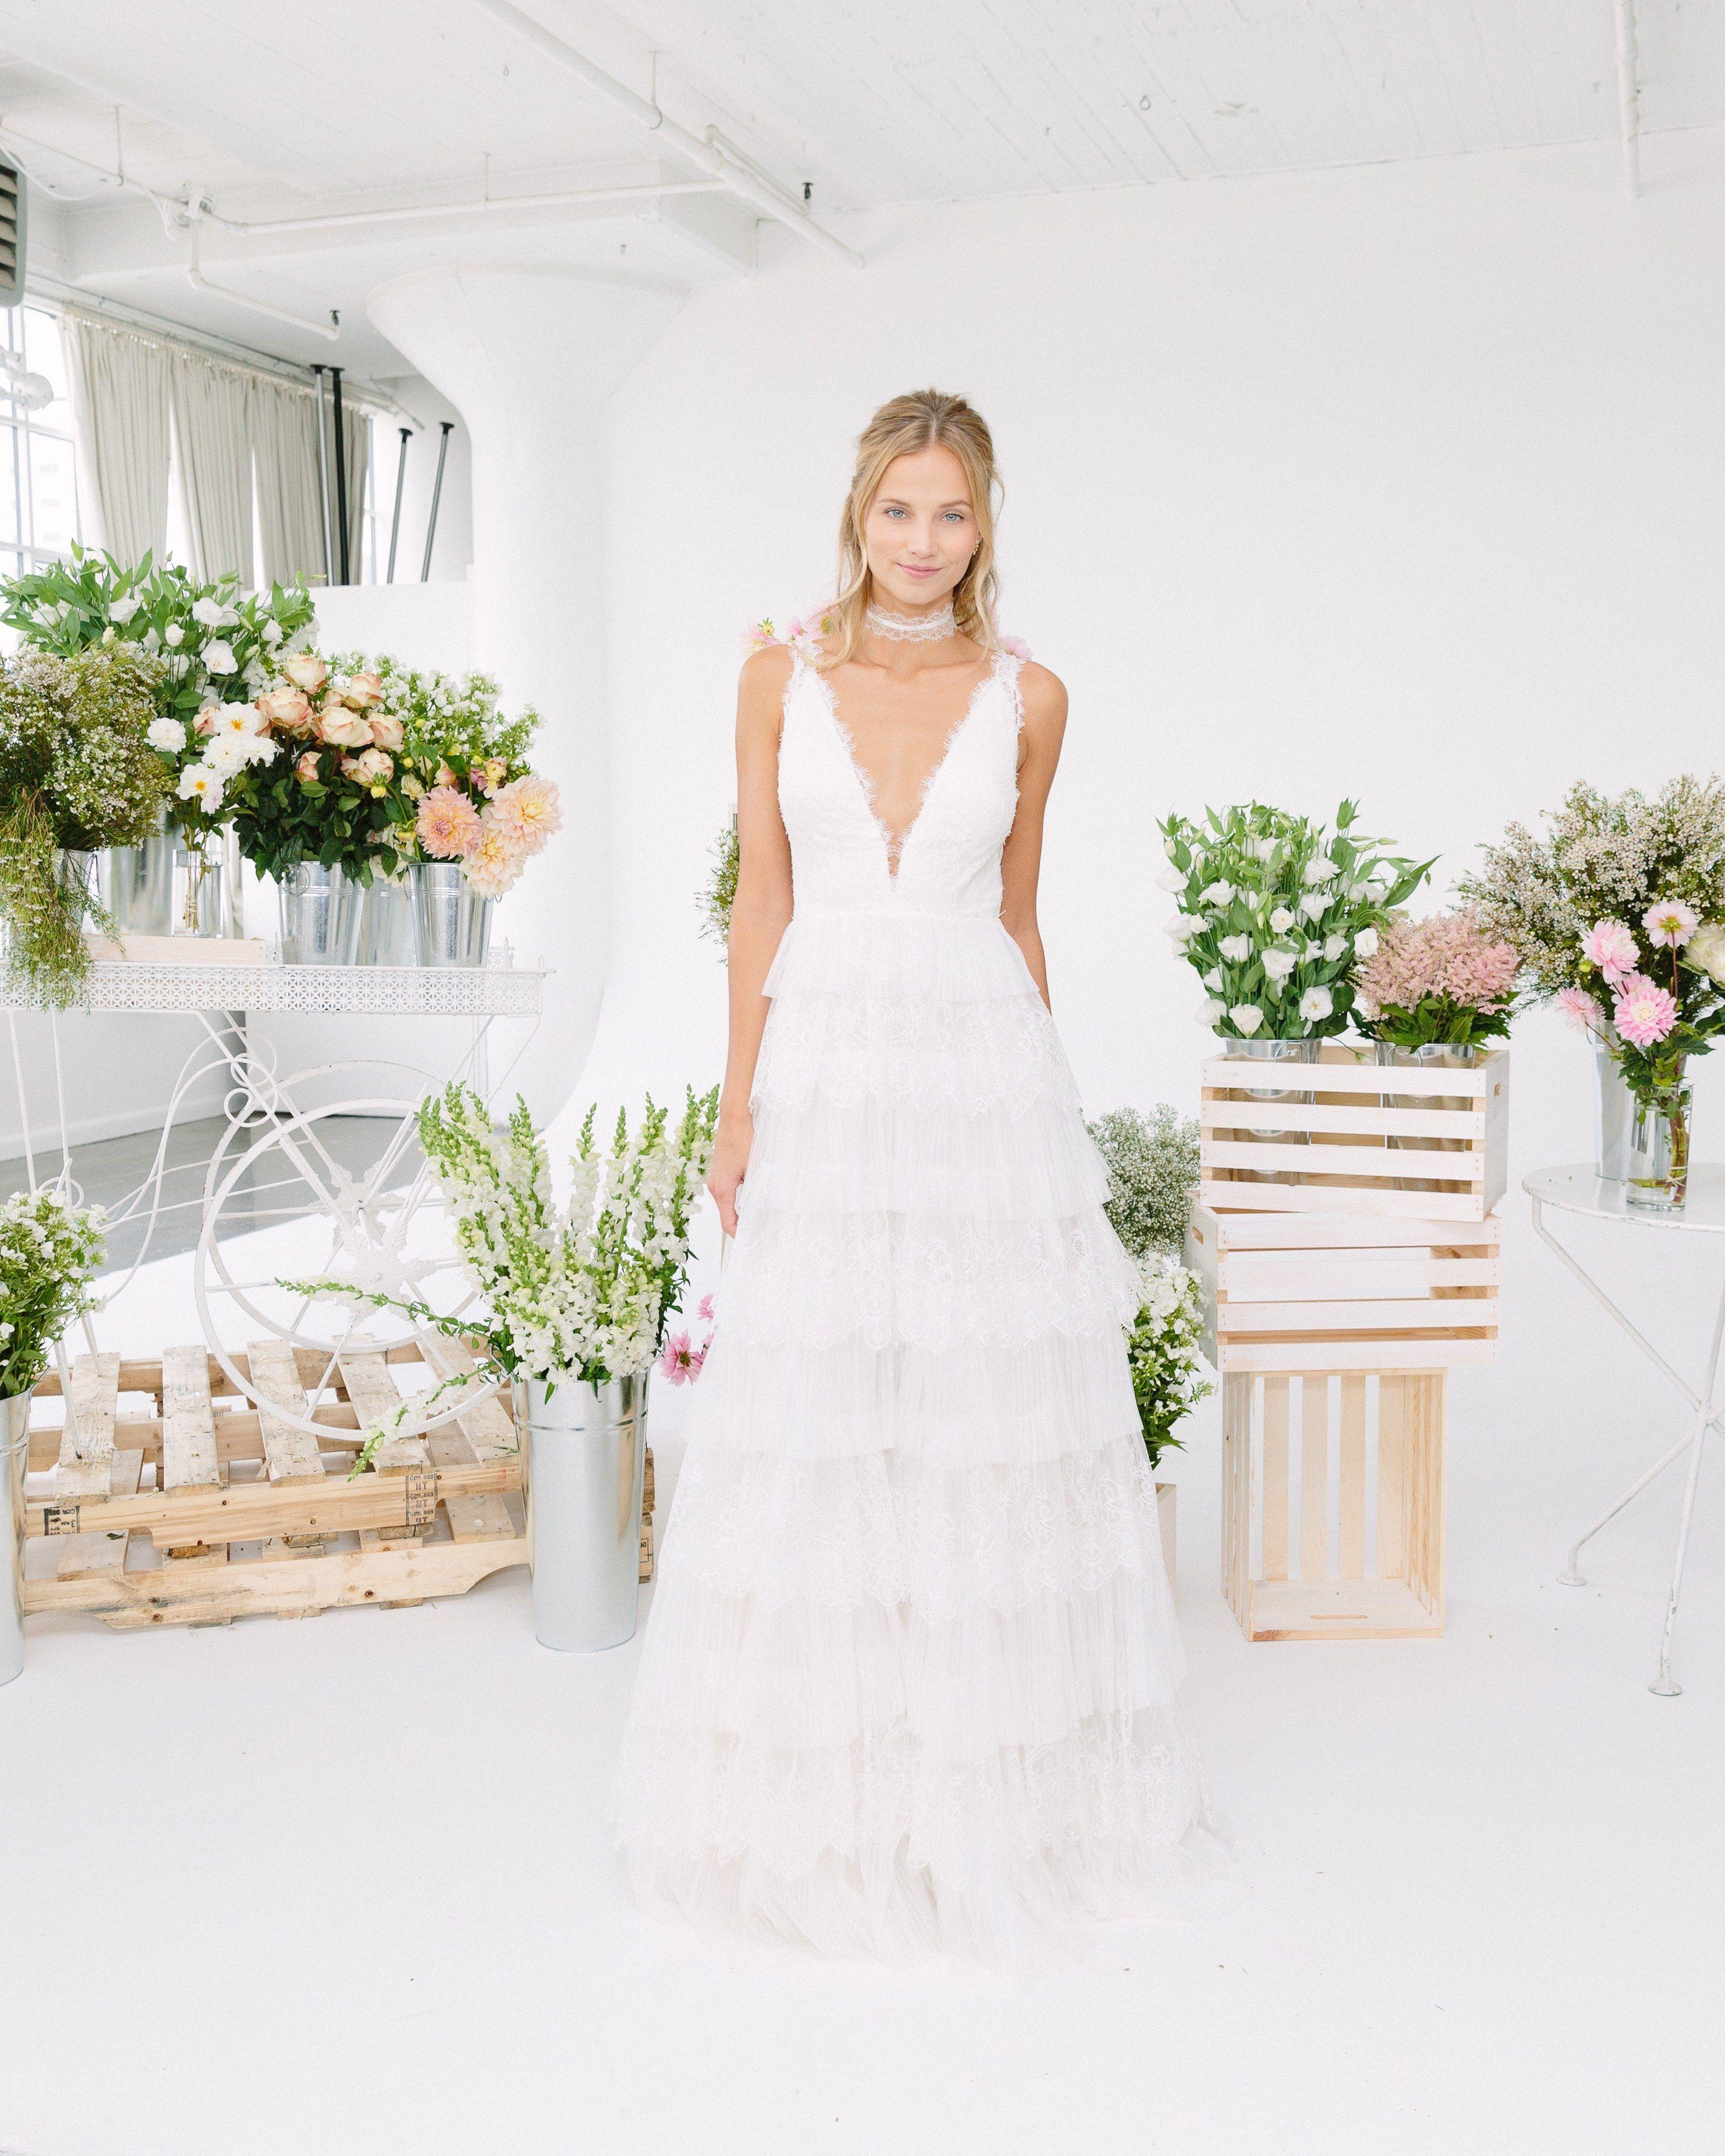 Marchesa Notte Bridal Wedding Dress Collection Fall 2018 Brides